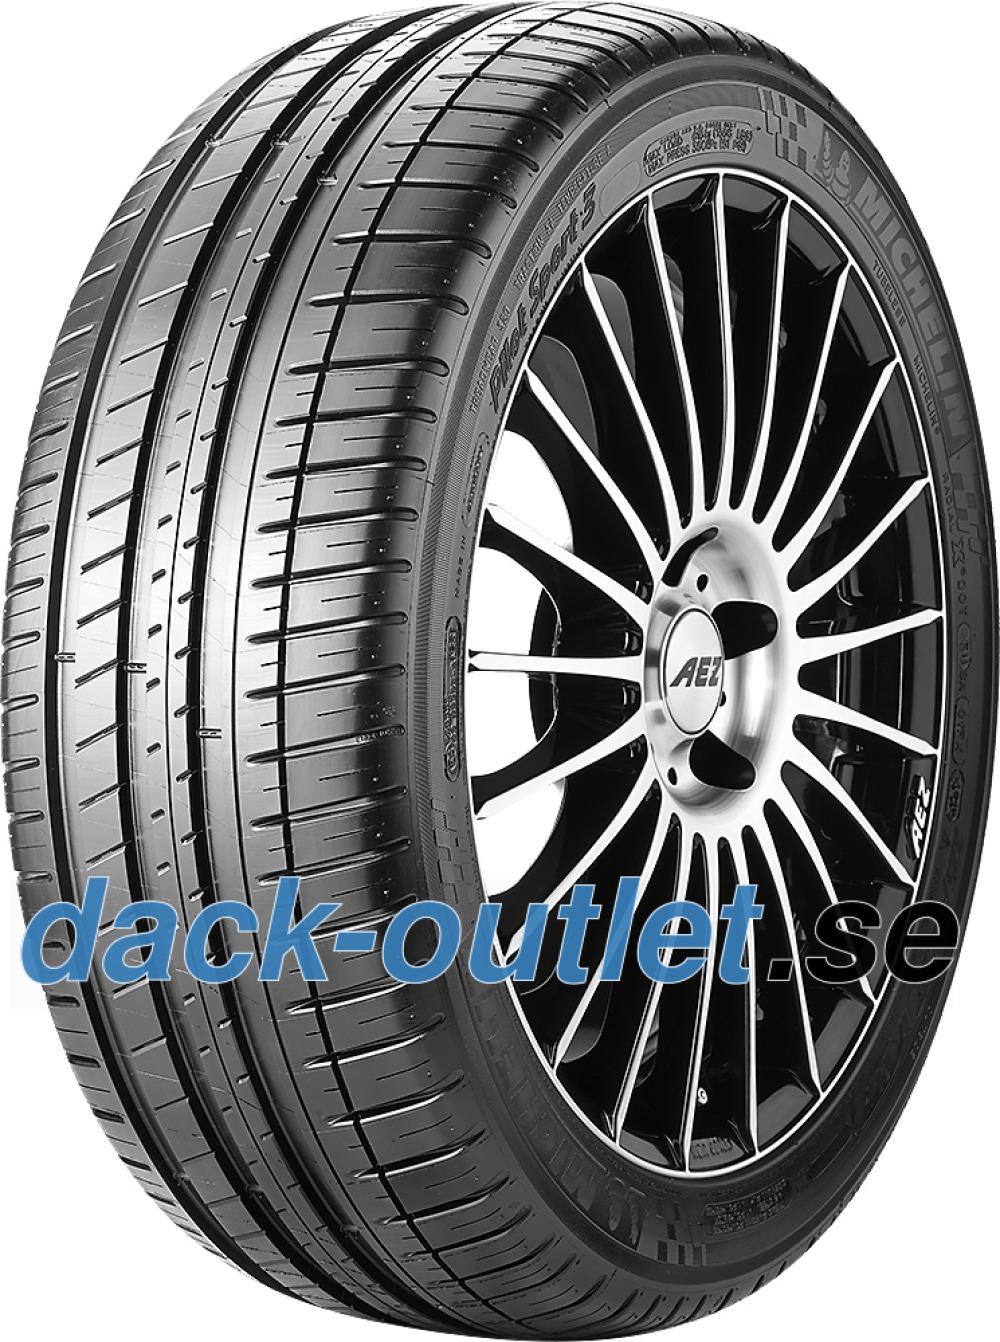 Michelin Pilot Sport 3 ( 255/40 ZR20 (101Y) XL Acoustic, MO, med fälg skyddslist (FSL) )